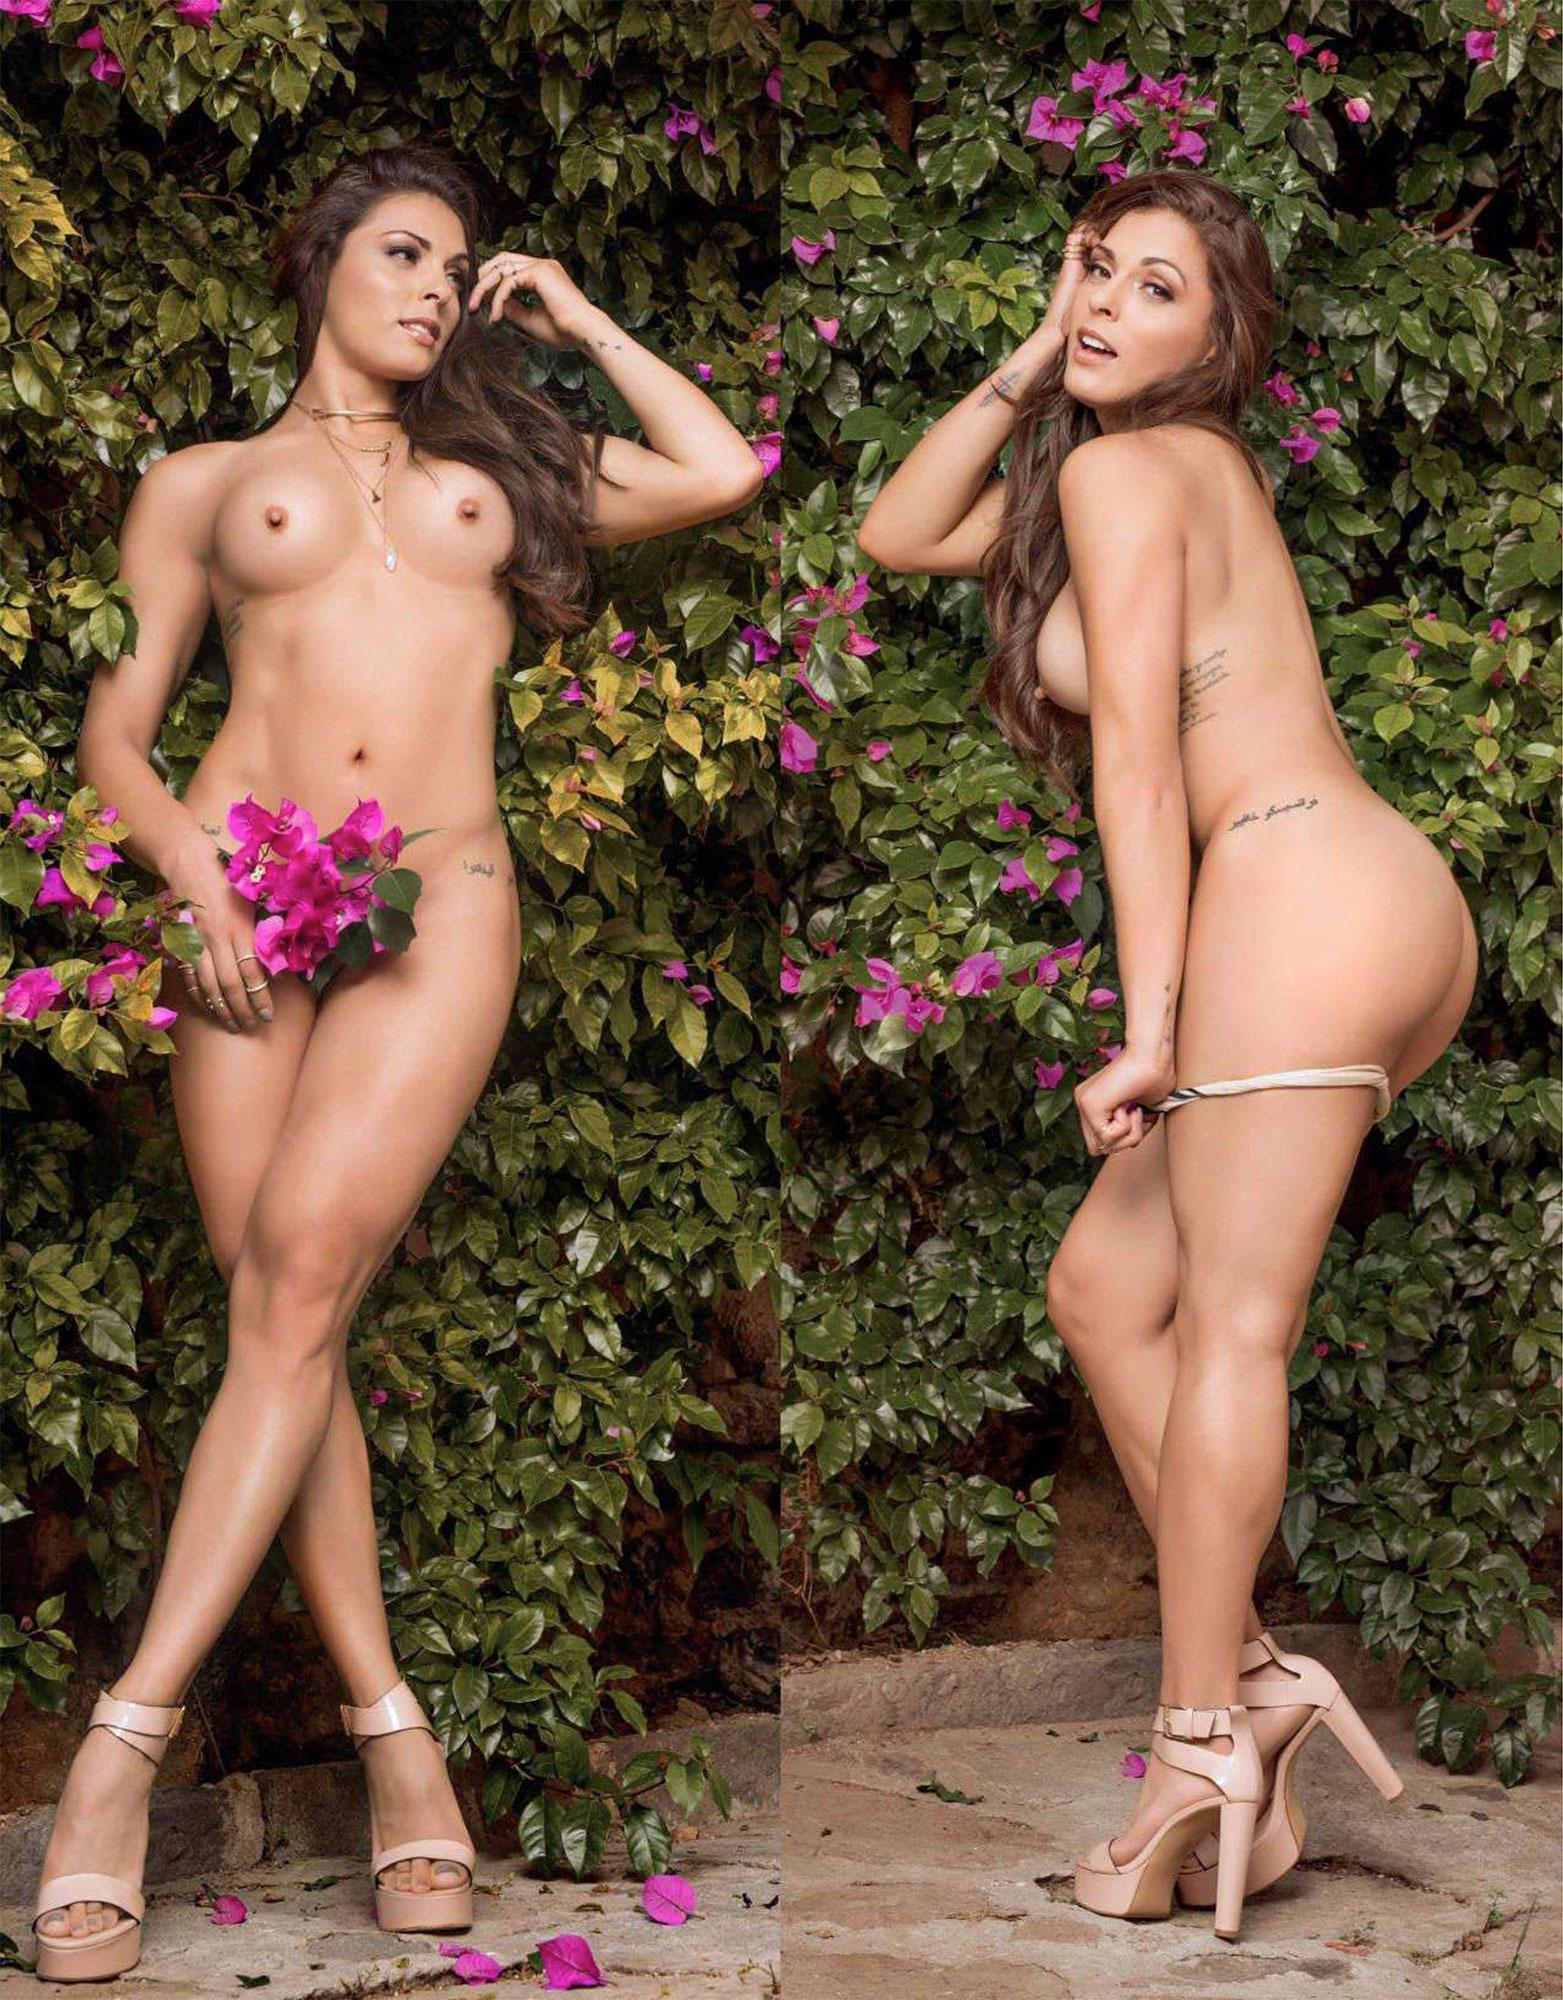 Alejandra Rivera Porno la jarocha ale rivera playboy mexico junio 2016 | magone 2016